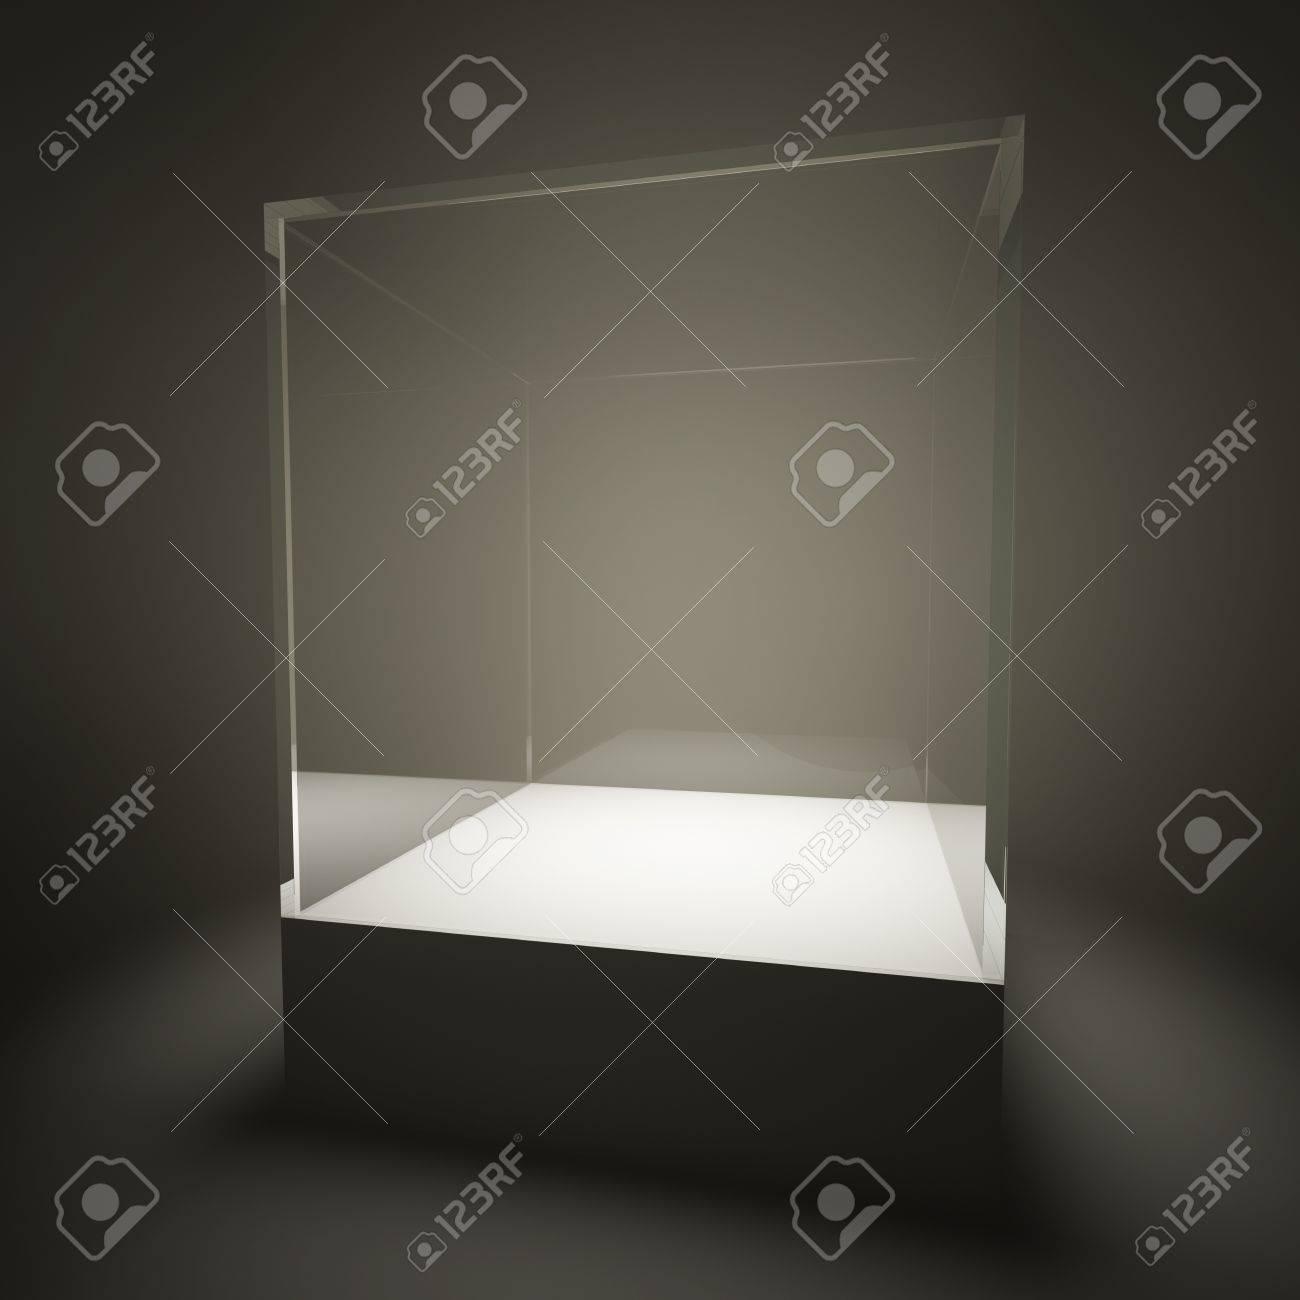 Illuminated empty glass showcase in room Stock Photo - 10854298